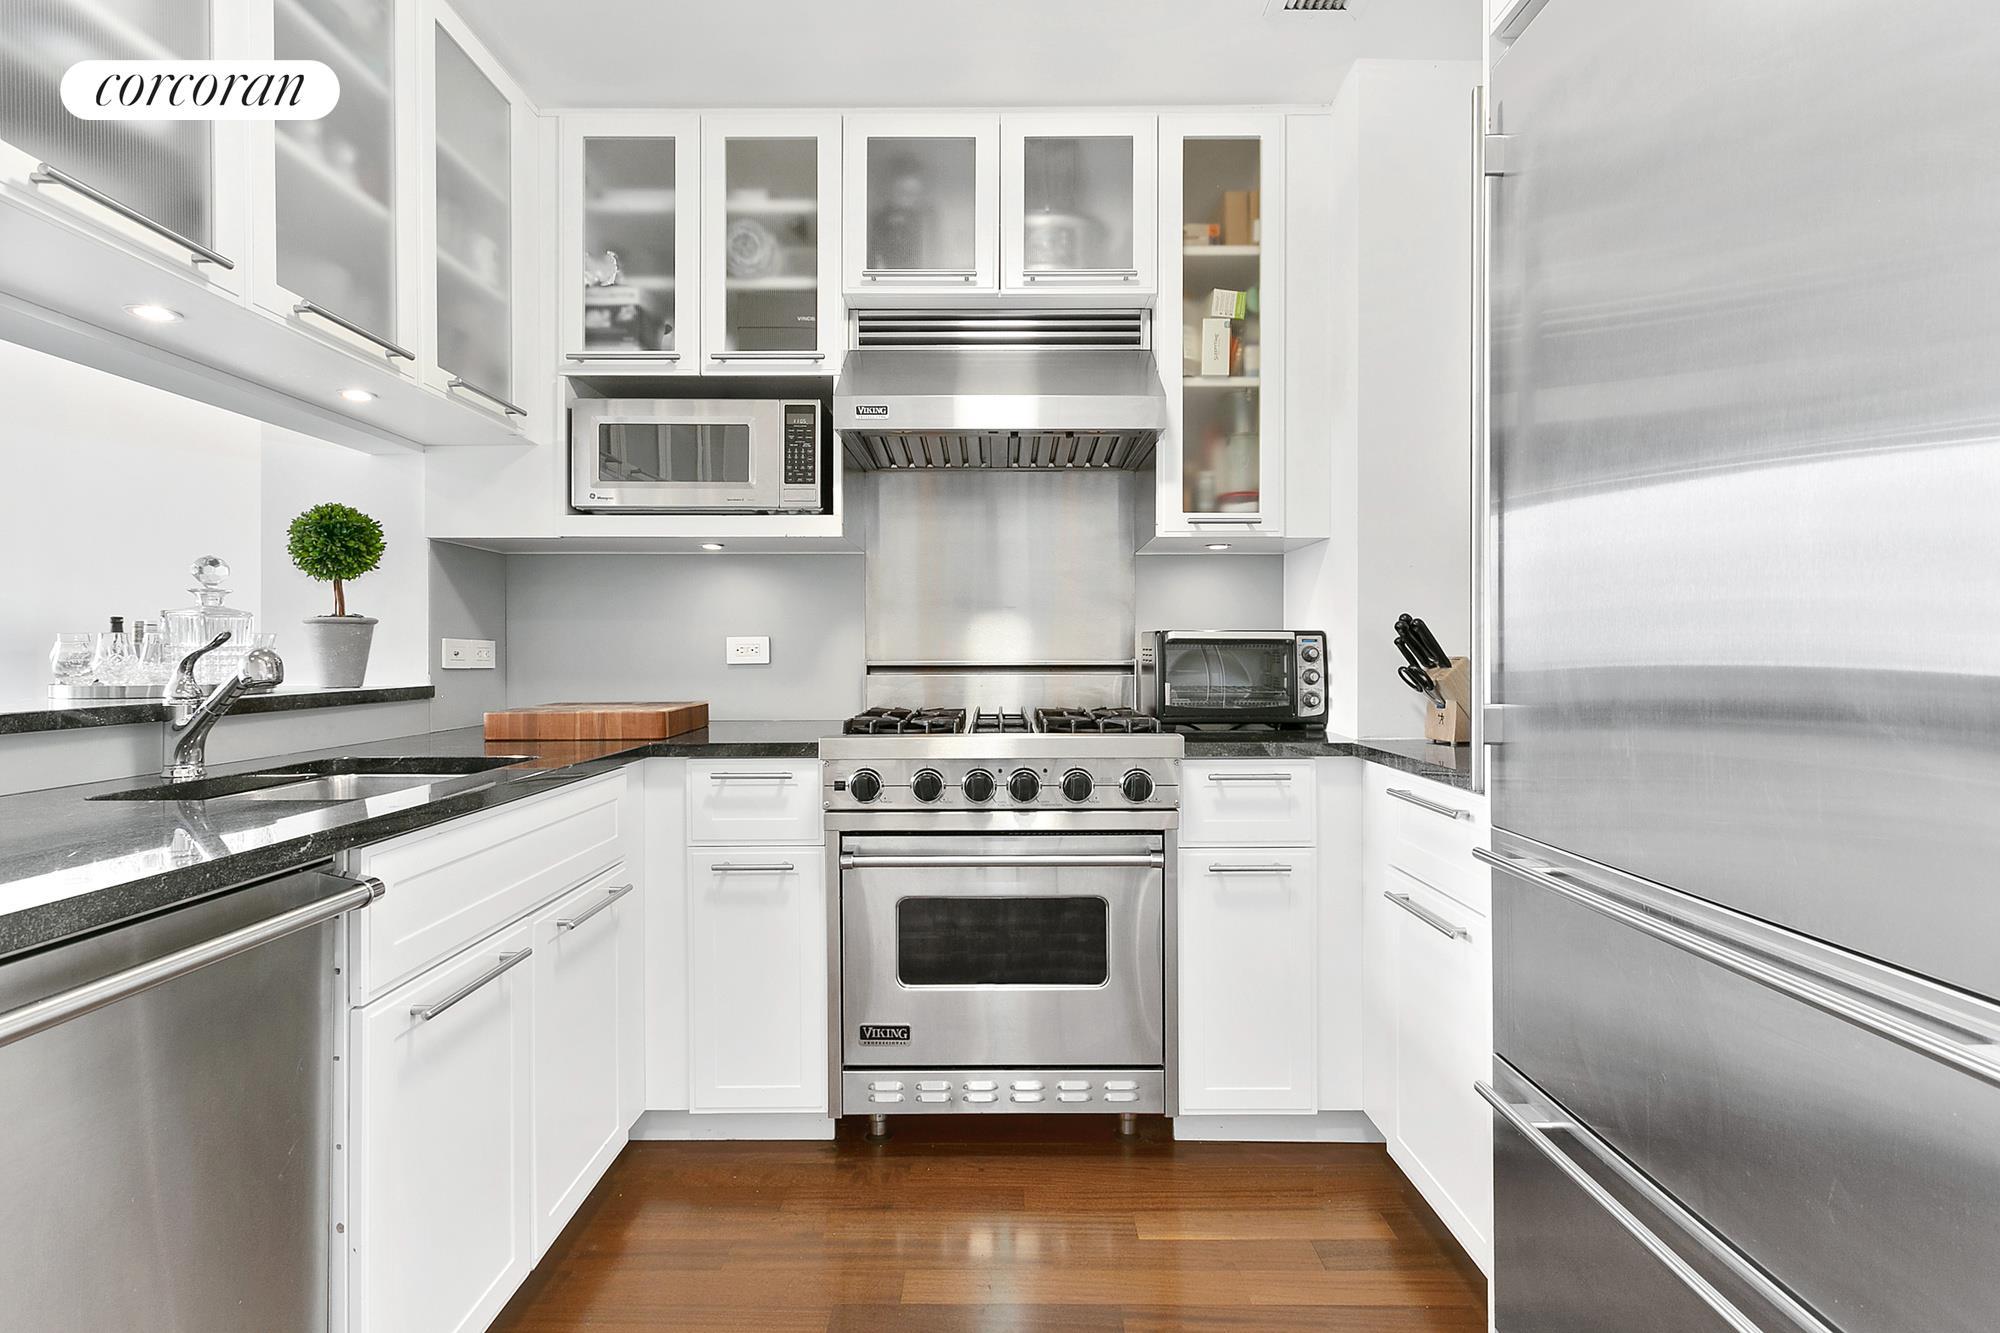 Corcoran, 45 Park Avenue, Apt  1605, Murray Hill Real Estate